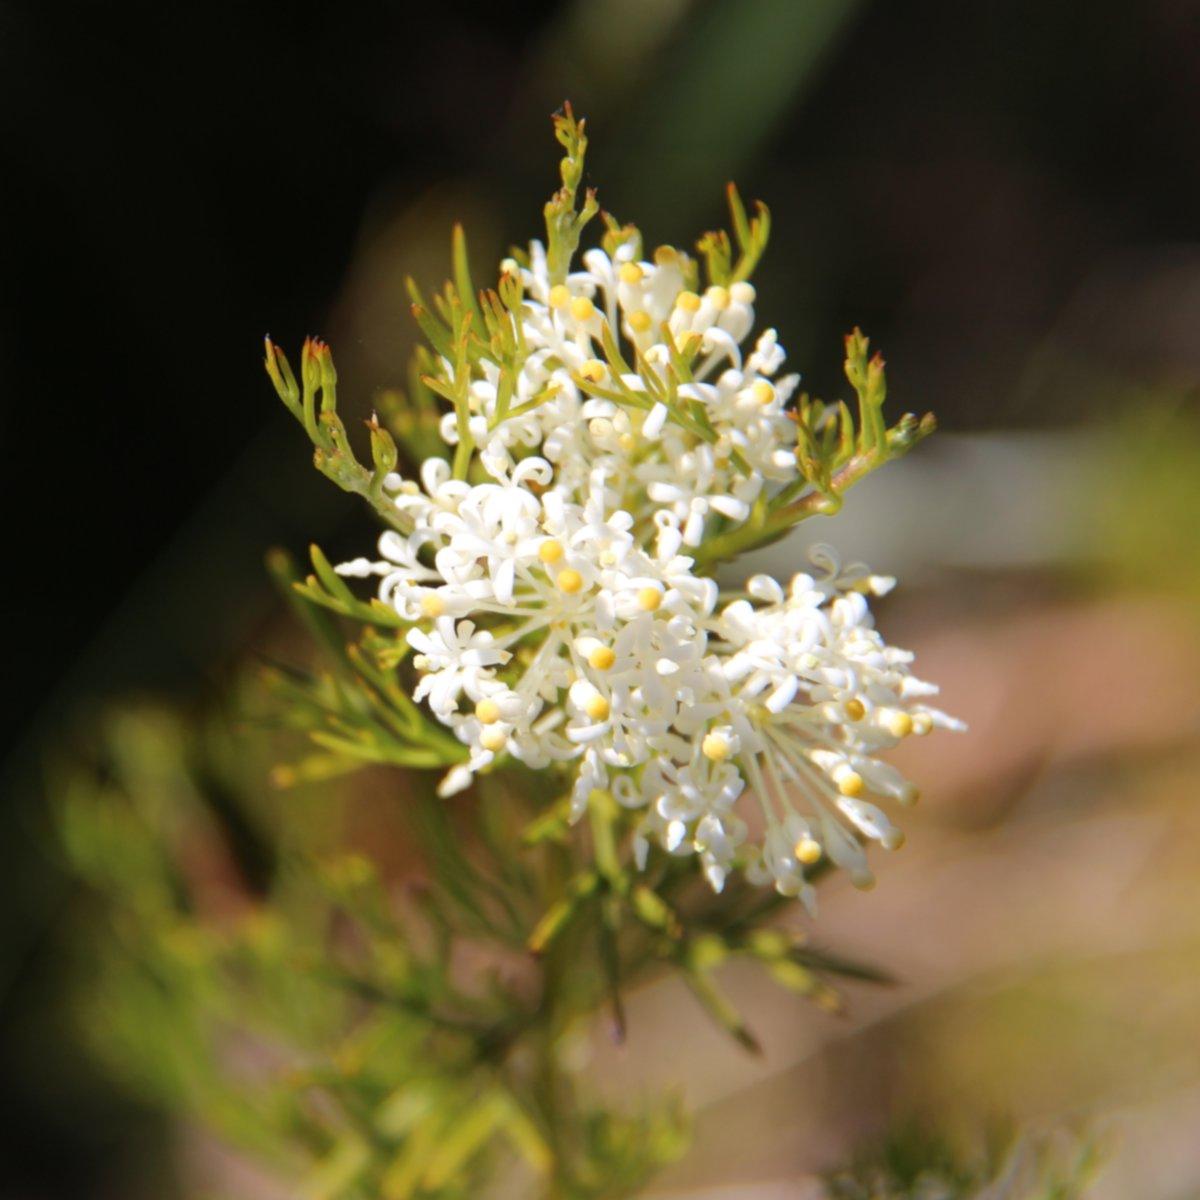 Guitar plant flower